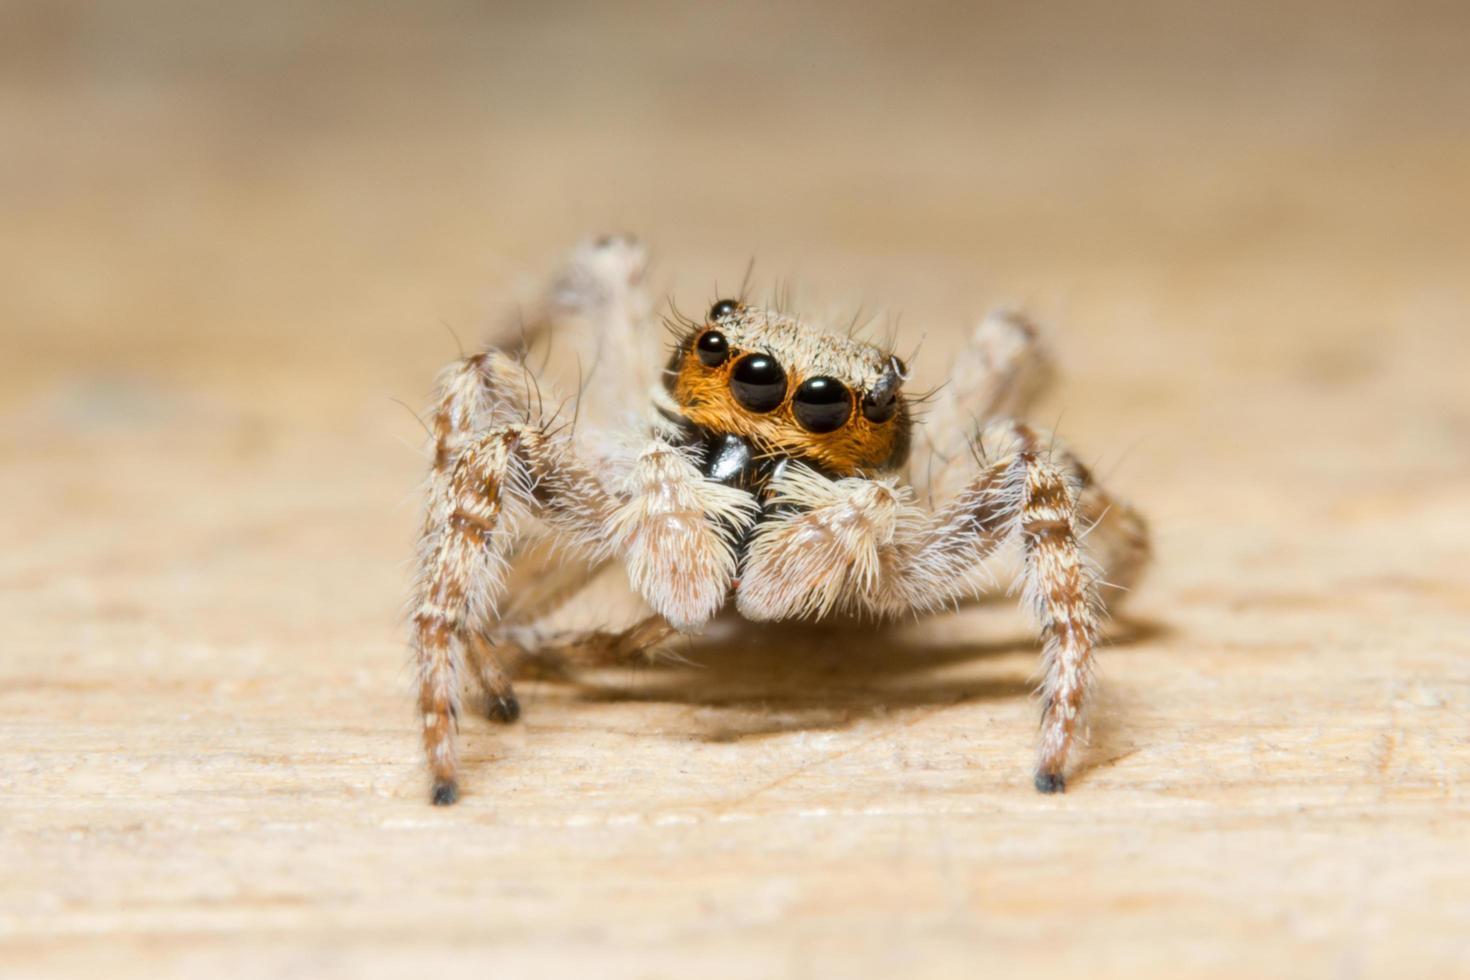 Macro spider on wood photo